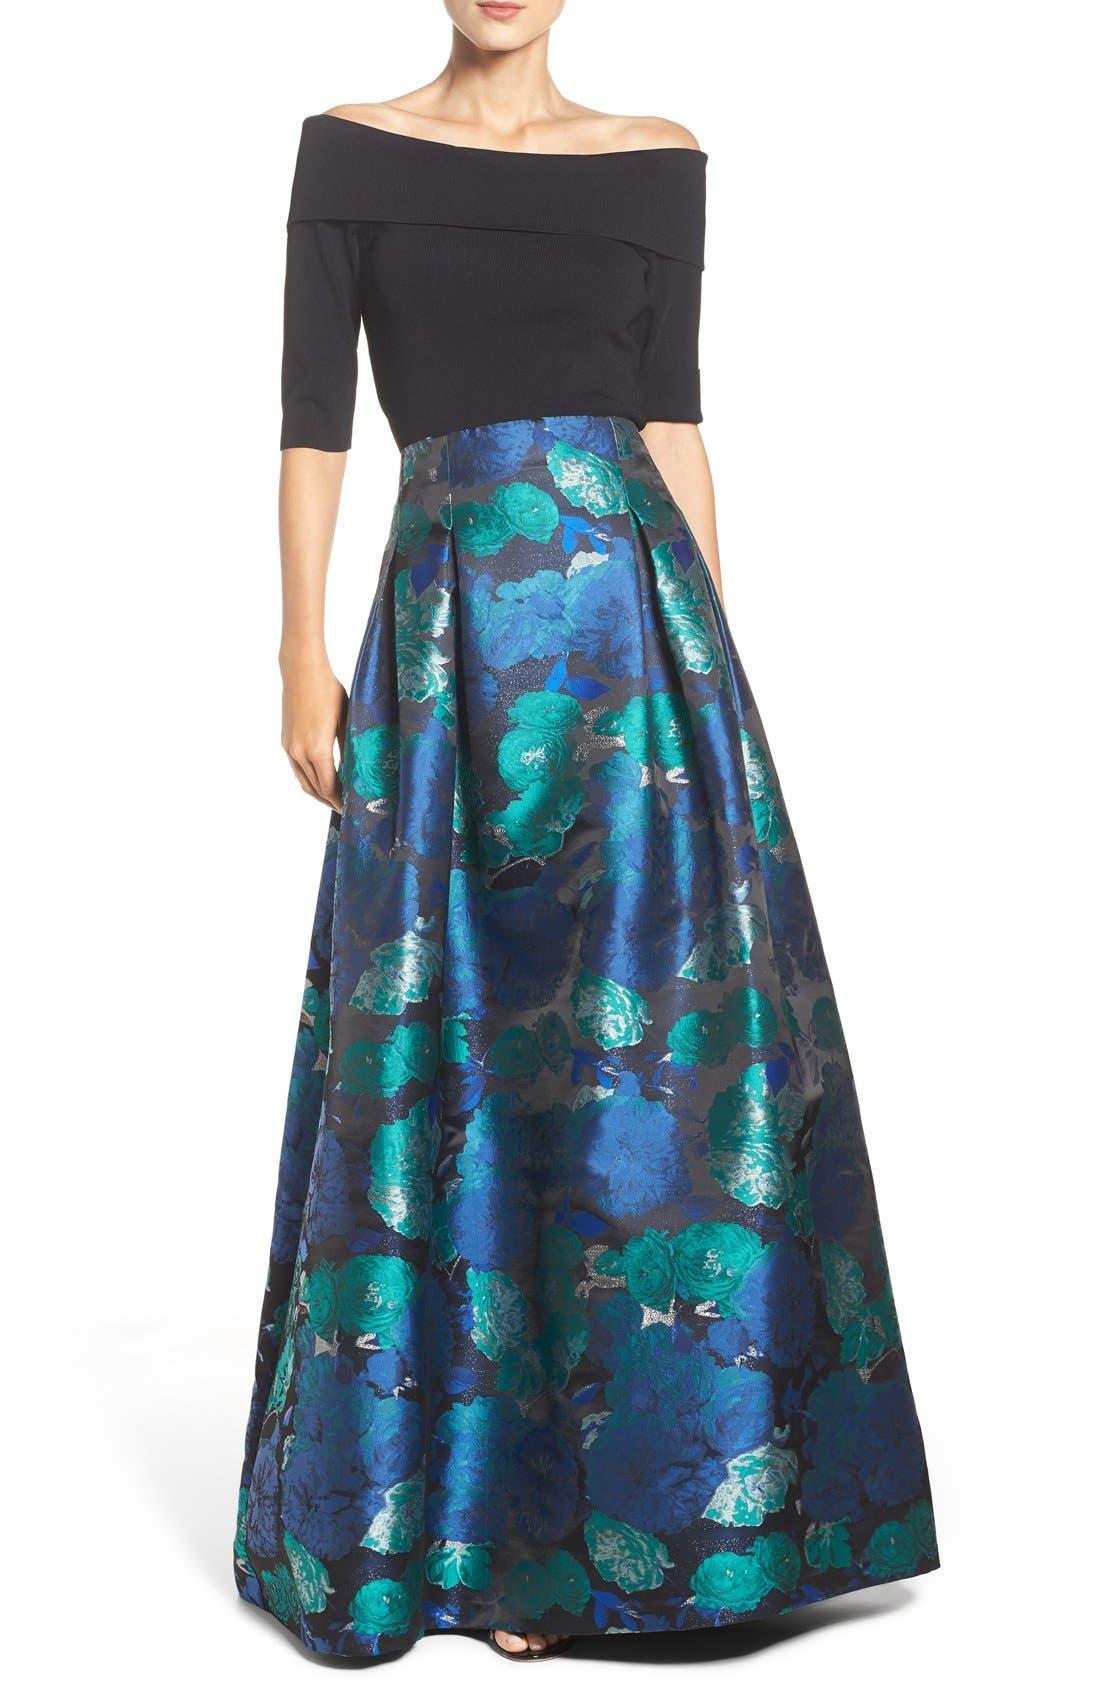 Floral Jacquard Ball Skirt,                             Alternate thumbnail 2, color,                             442